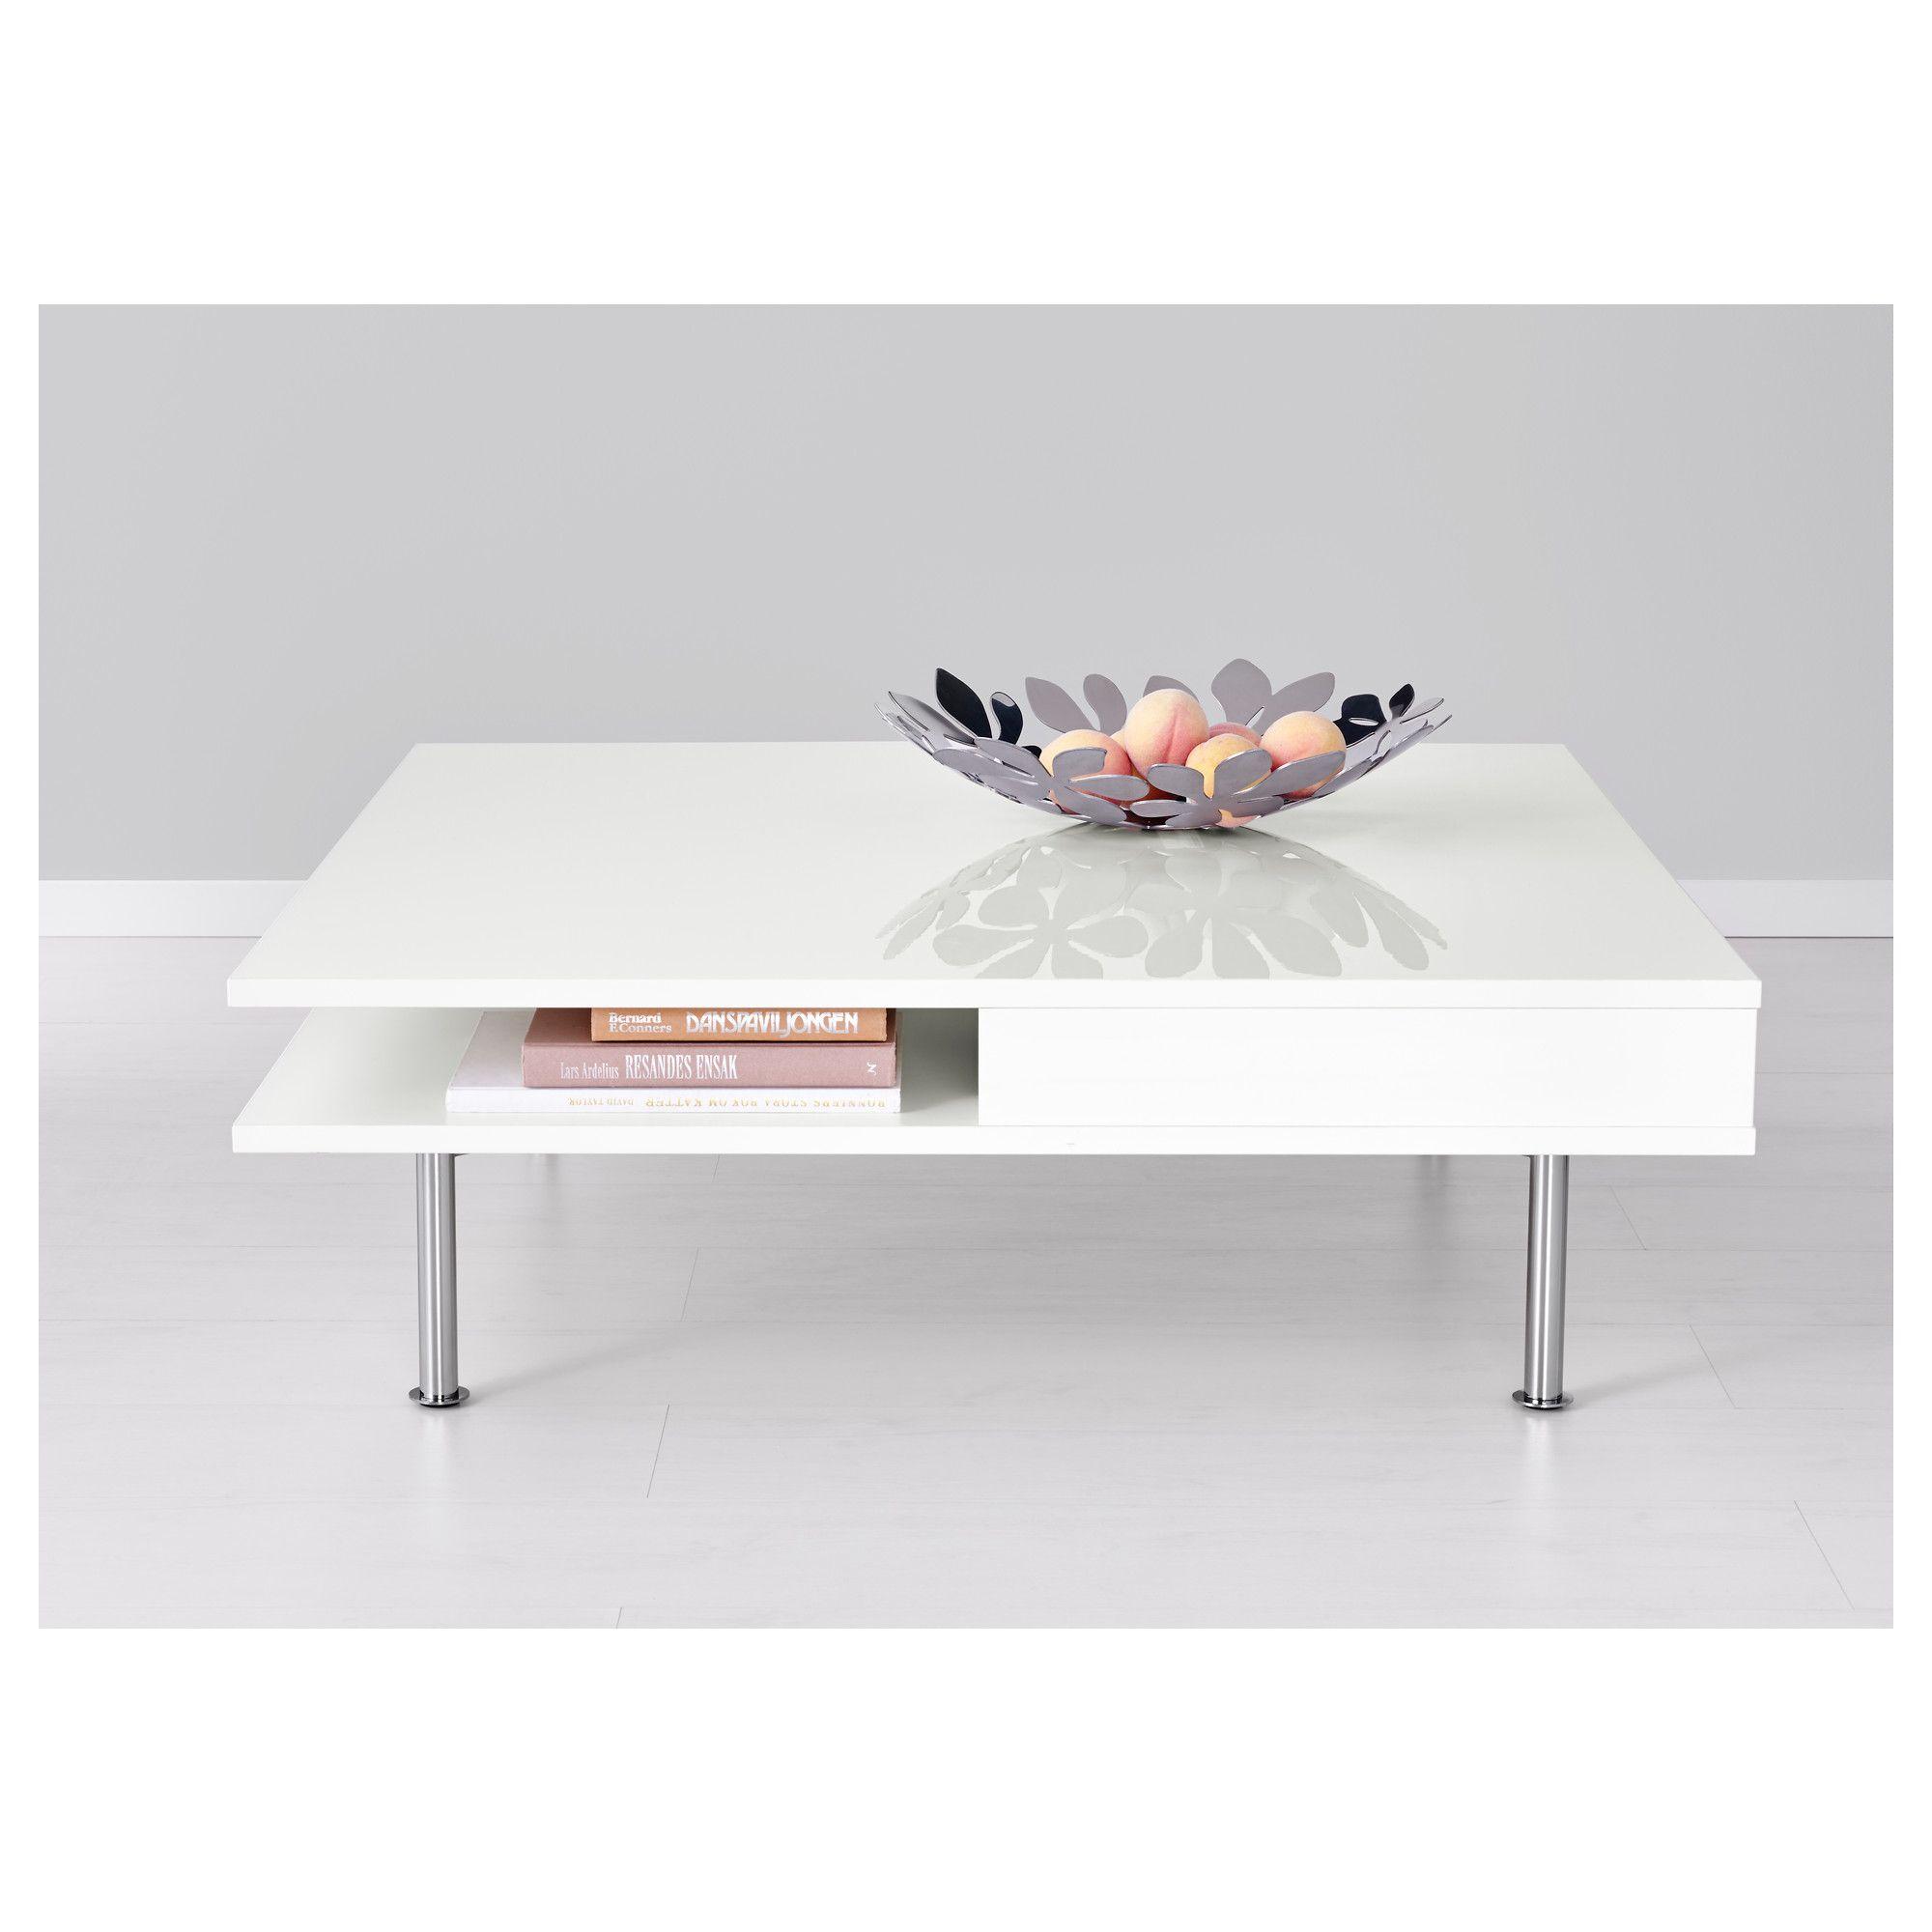 Tofteryd Trapezi Meshs Ikea Coffee Table Coffee Table High Gloss Ikea Coffee Table [ 2000 x 2000 Pixel ]